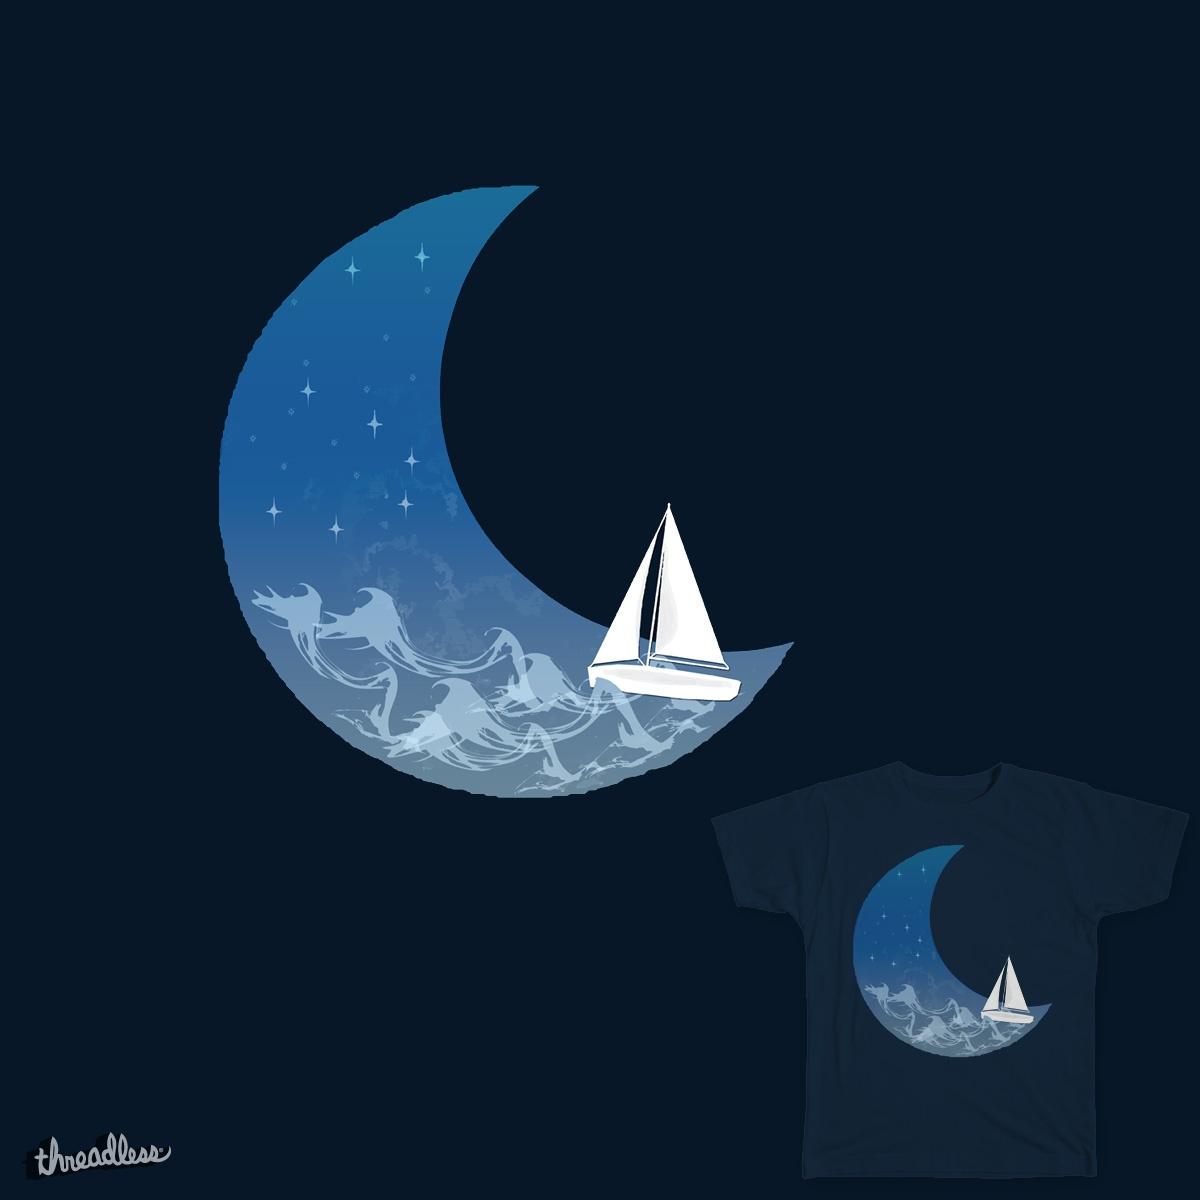 Moon Sailing by Sloganart on Threadless